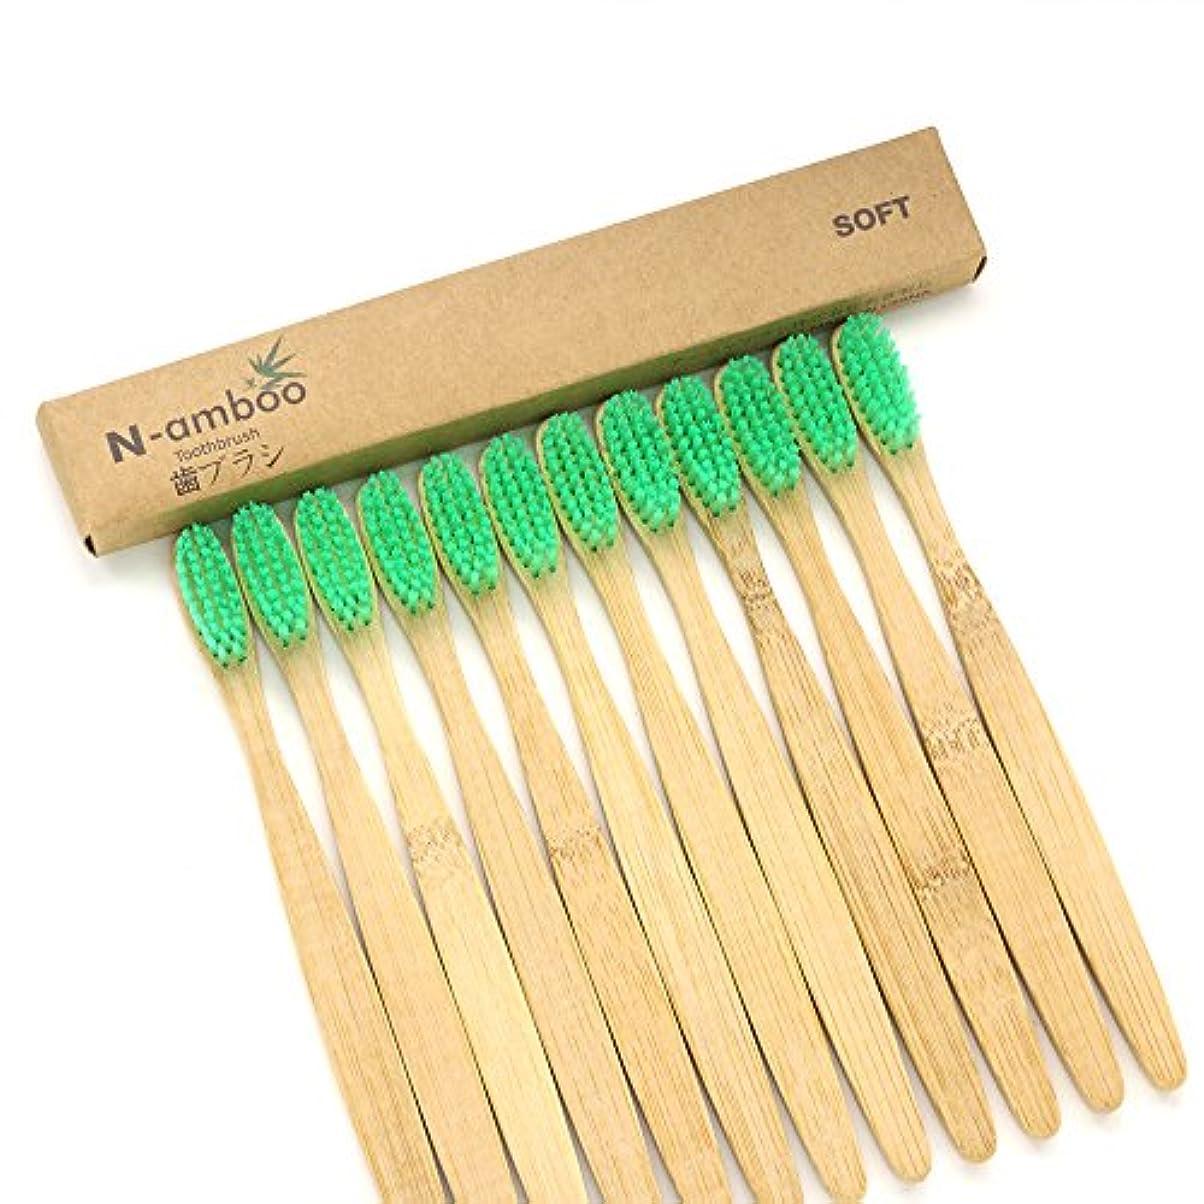 N-amboo 竹製 歯ブラシ 高耐久性 セット エコ 軽量 12本入り 緑 セット